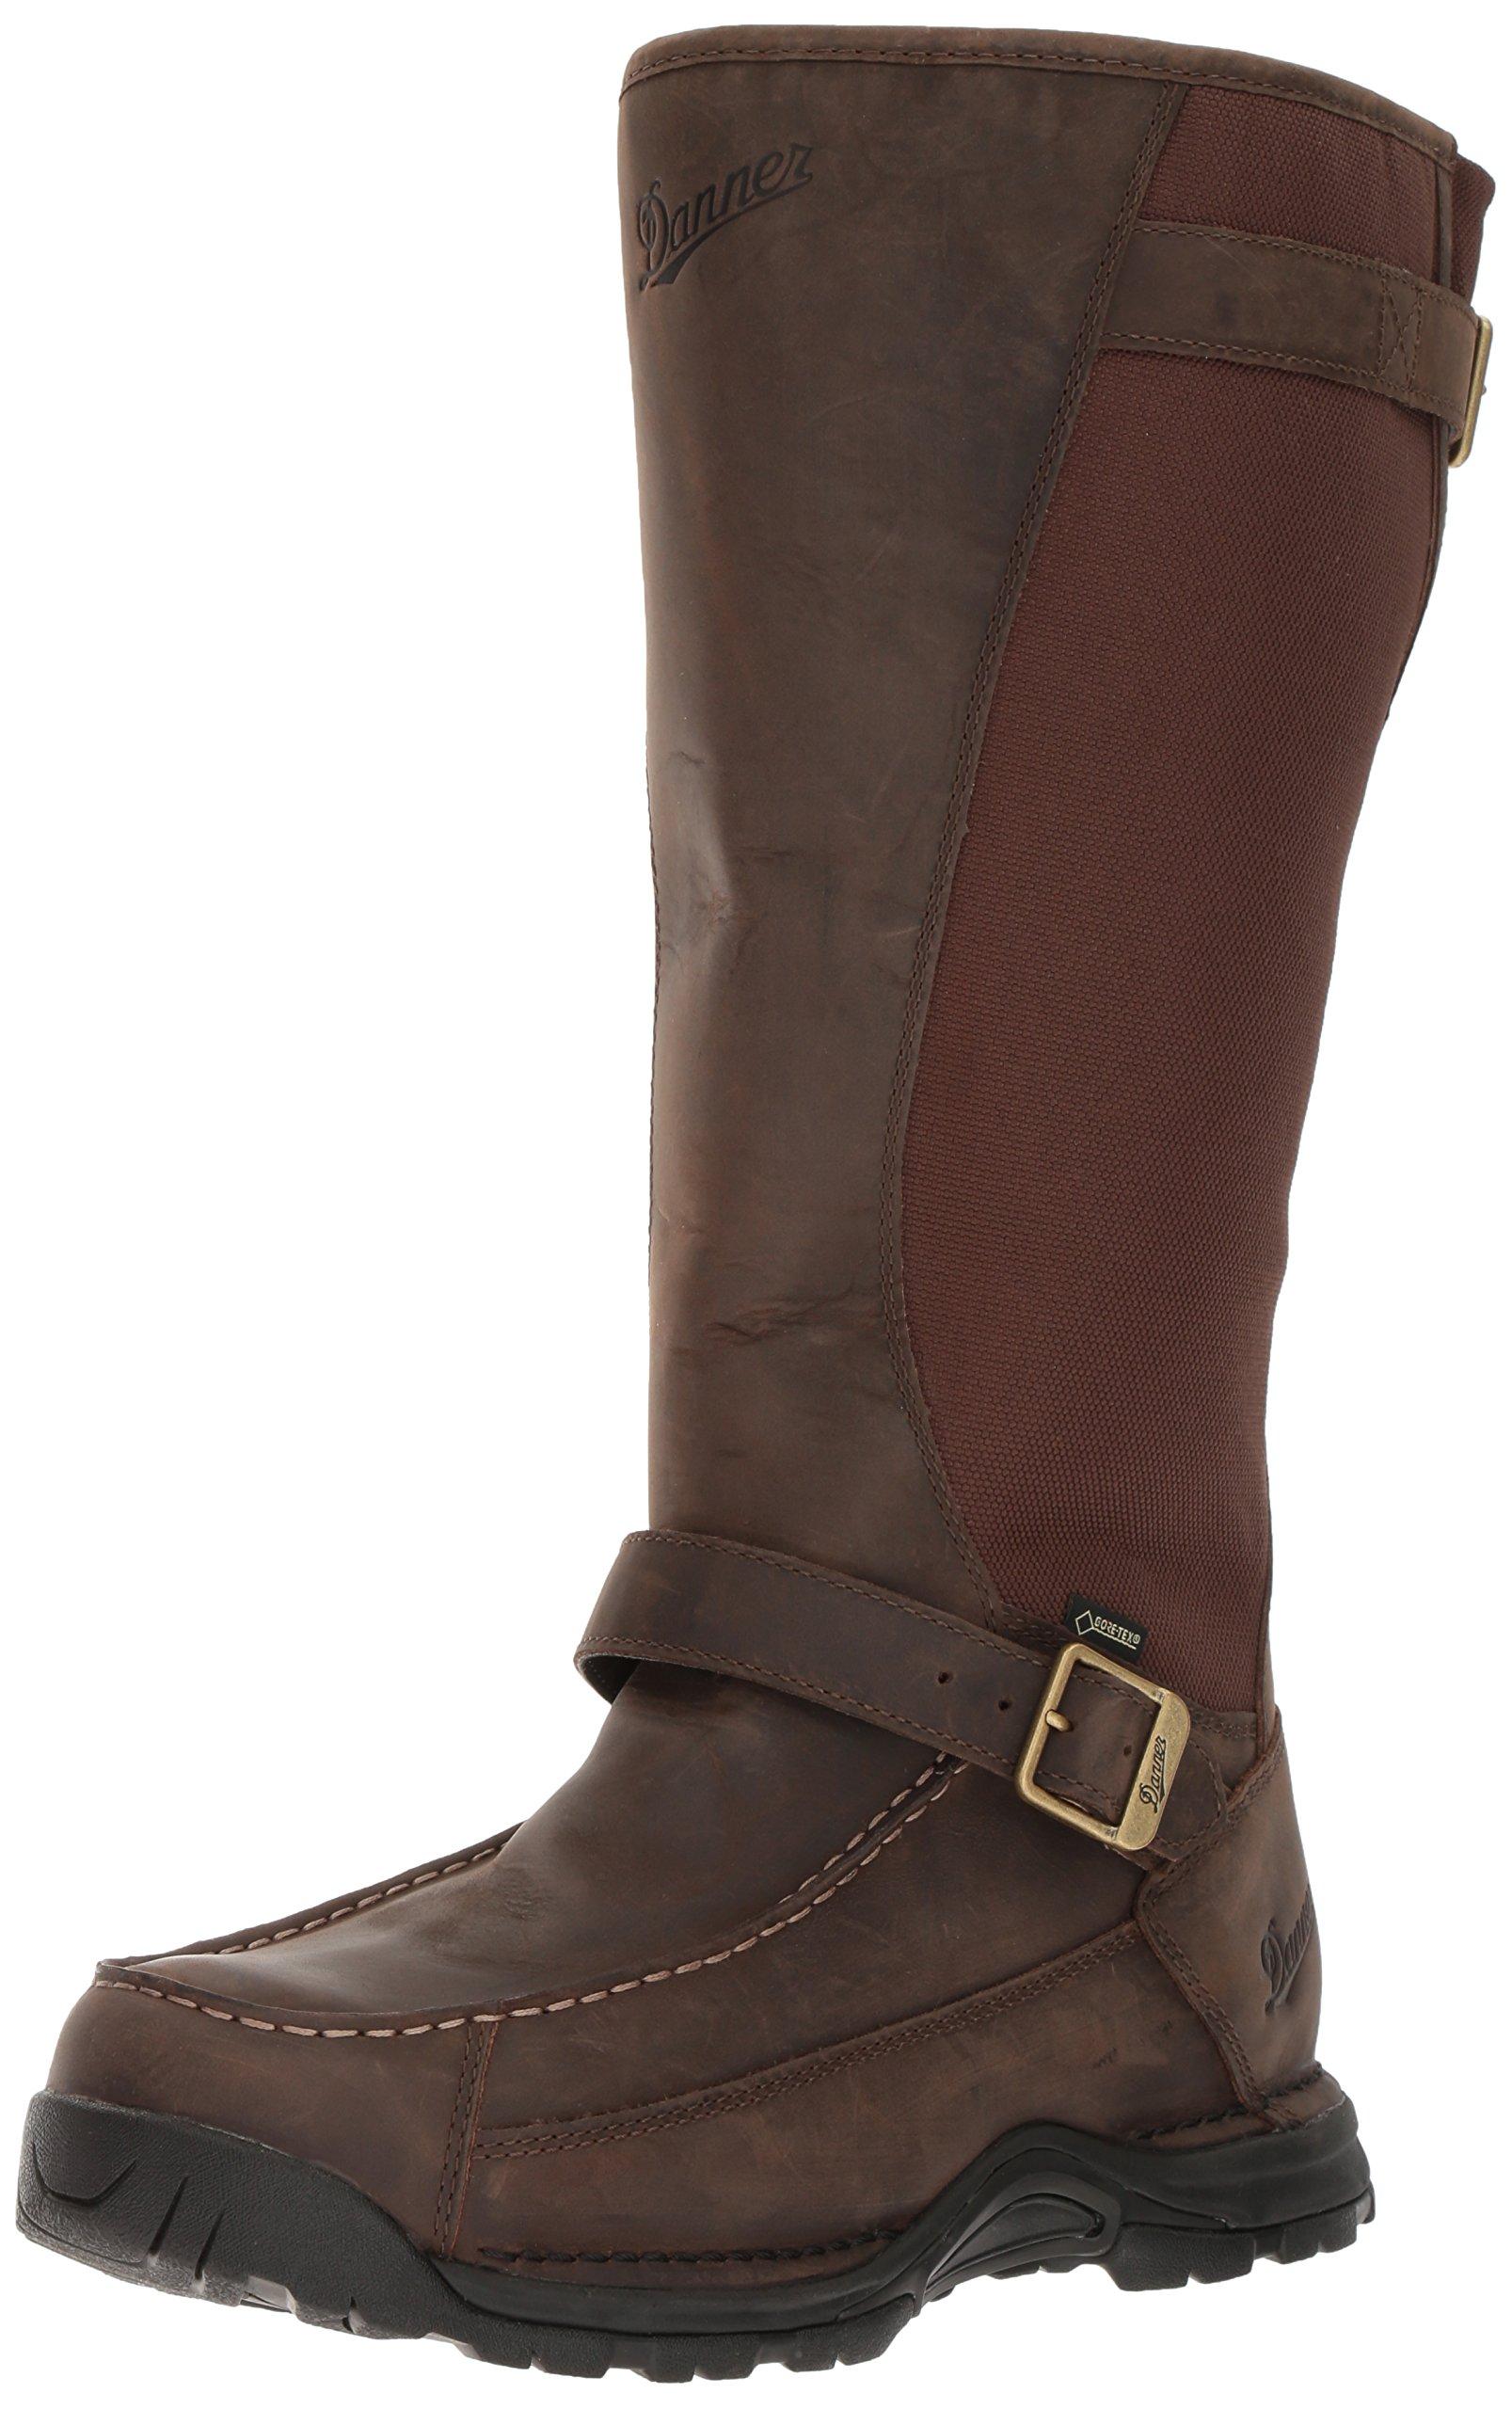 Danner Men's Sharptail Snake Boot 17 Inch Dark Brown Hunting Boot , 10 2E US by Danner